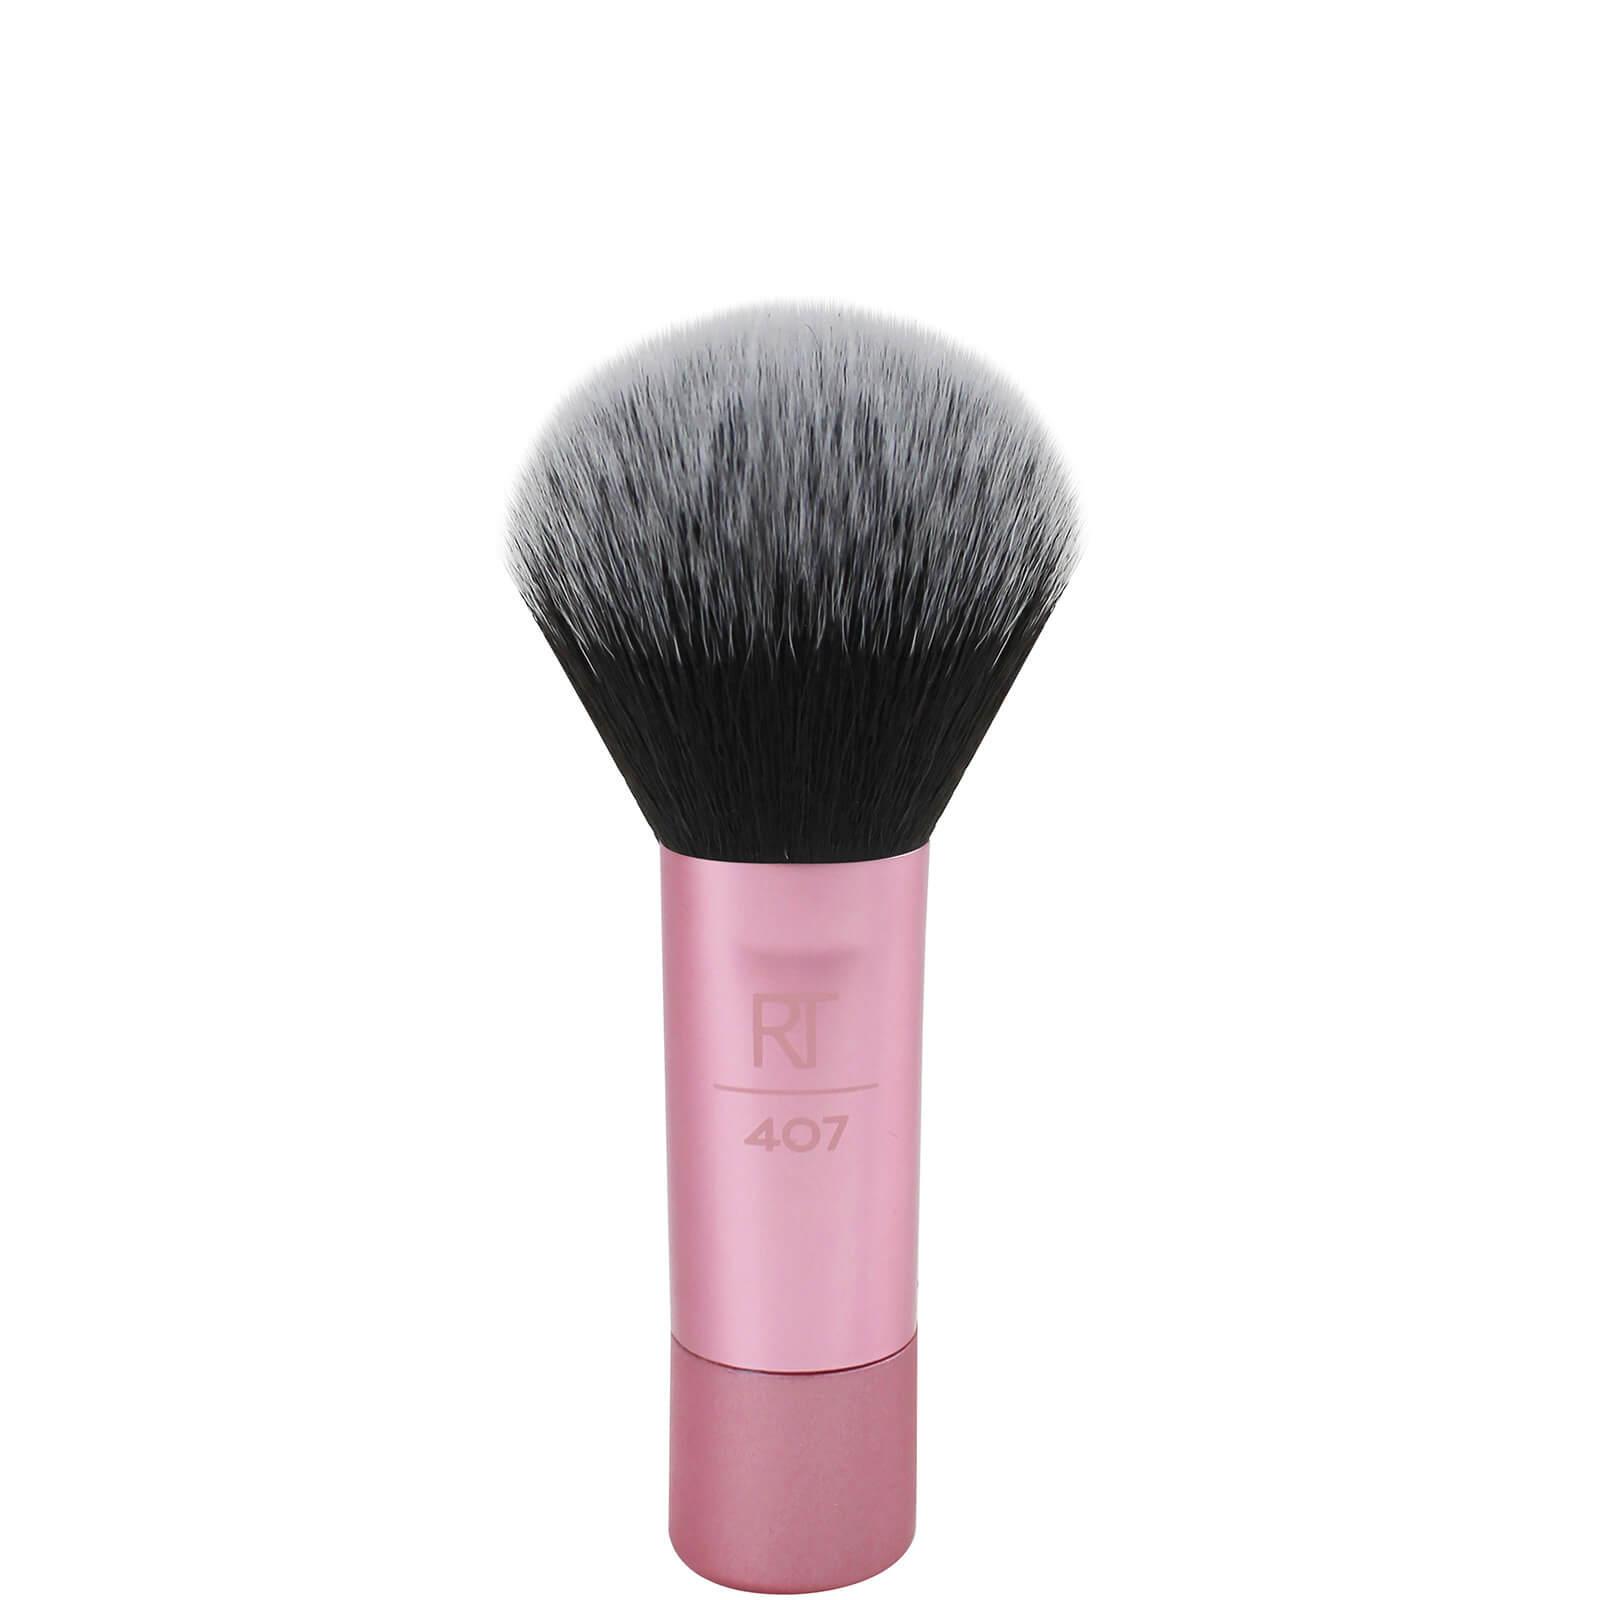 Купить Real Techniques Mini Multitask Brush